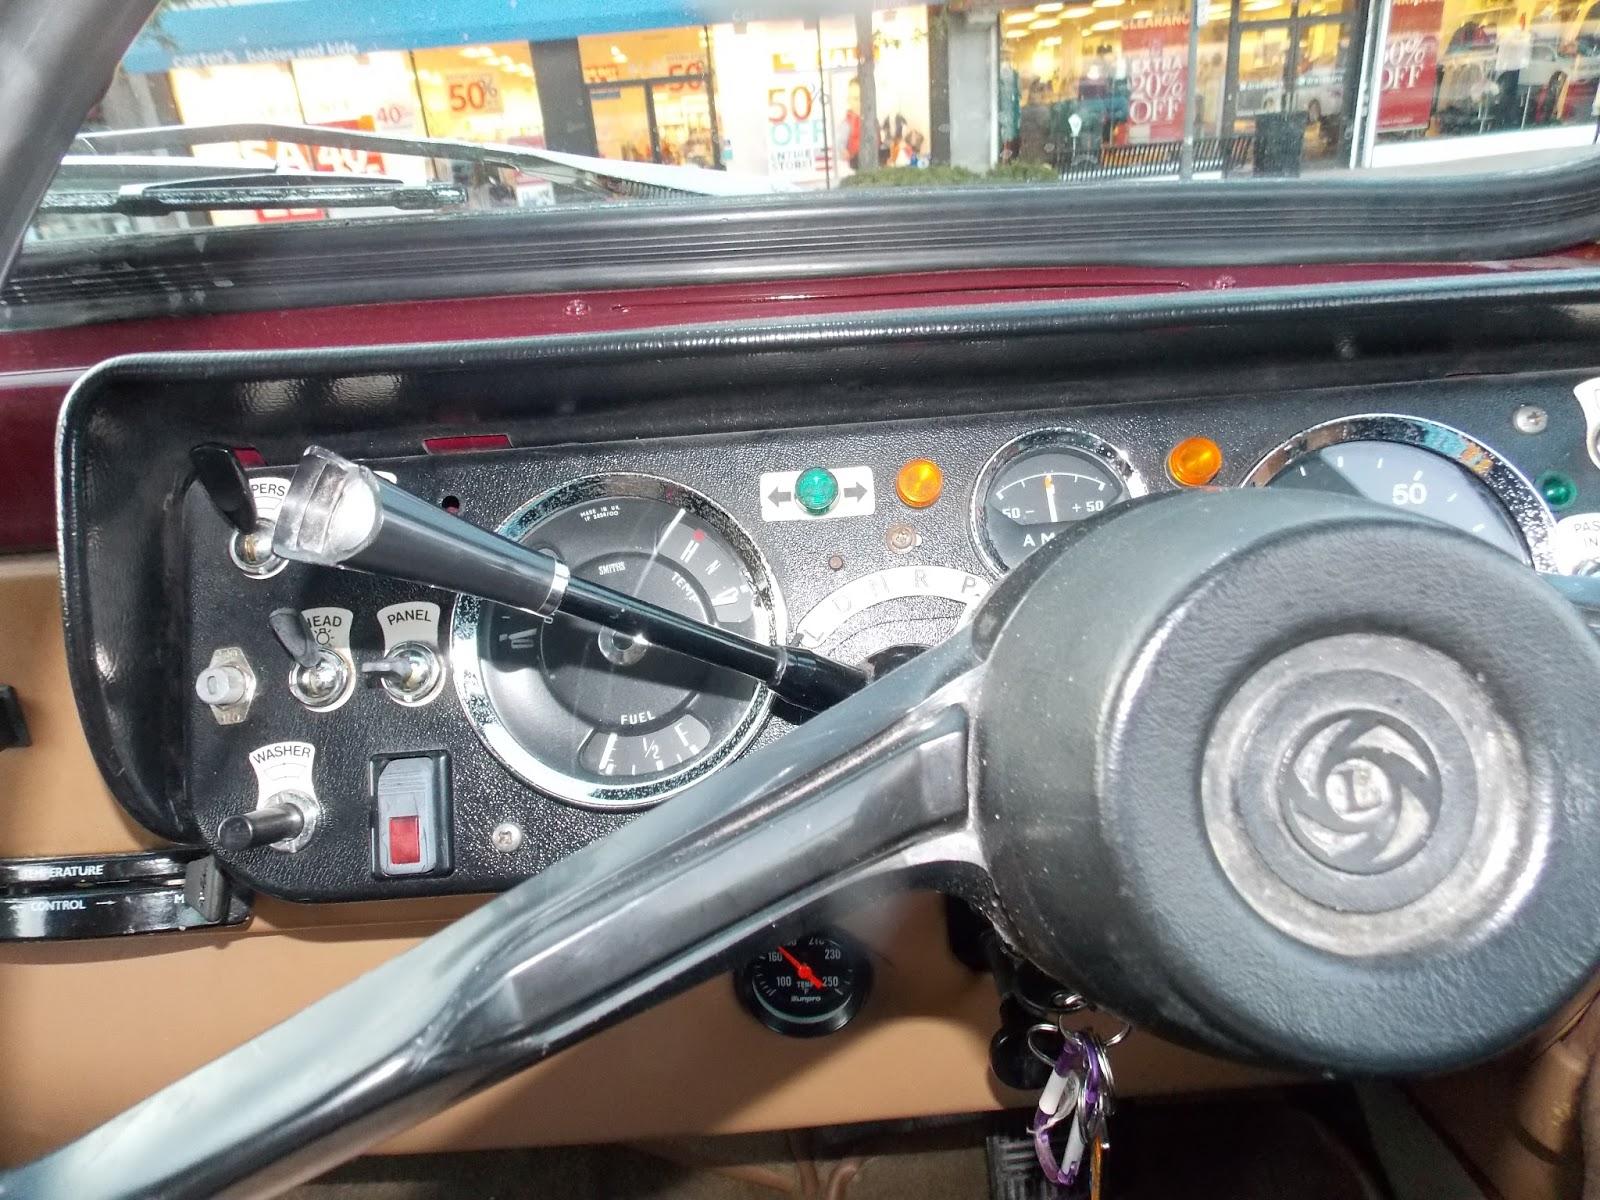 Repairing Mercedes Benz Air Suspension 50 Cheaper Than Dealers 2000 S500 Fuse Box Home Visit Limousine Rentalnet